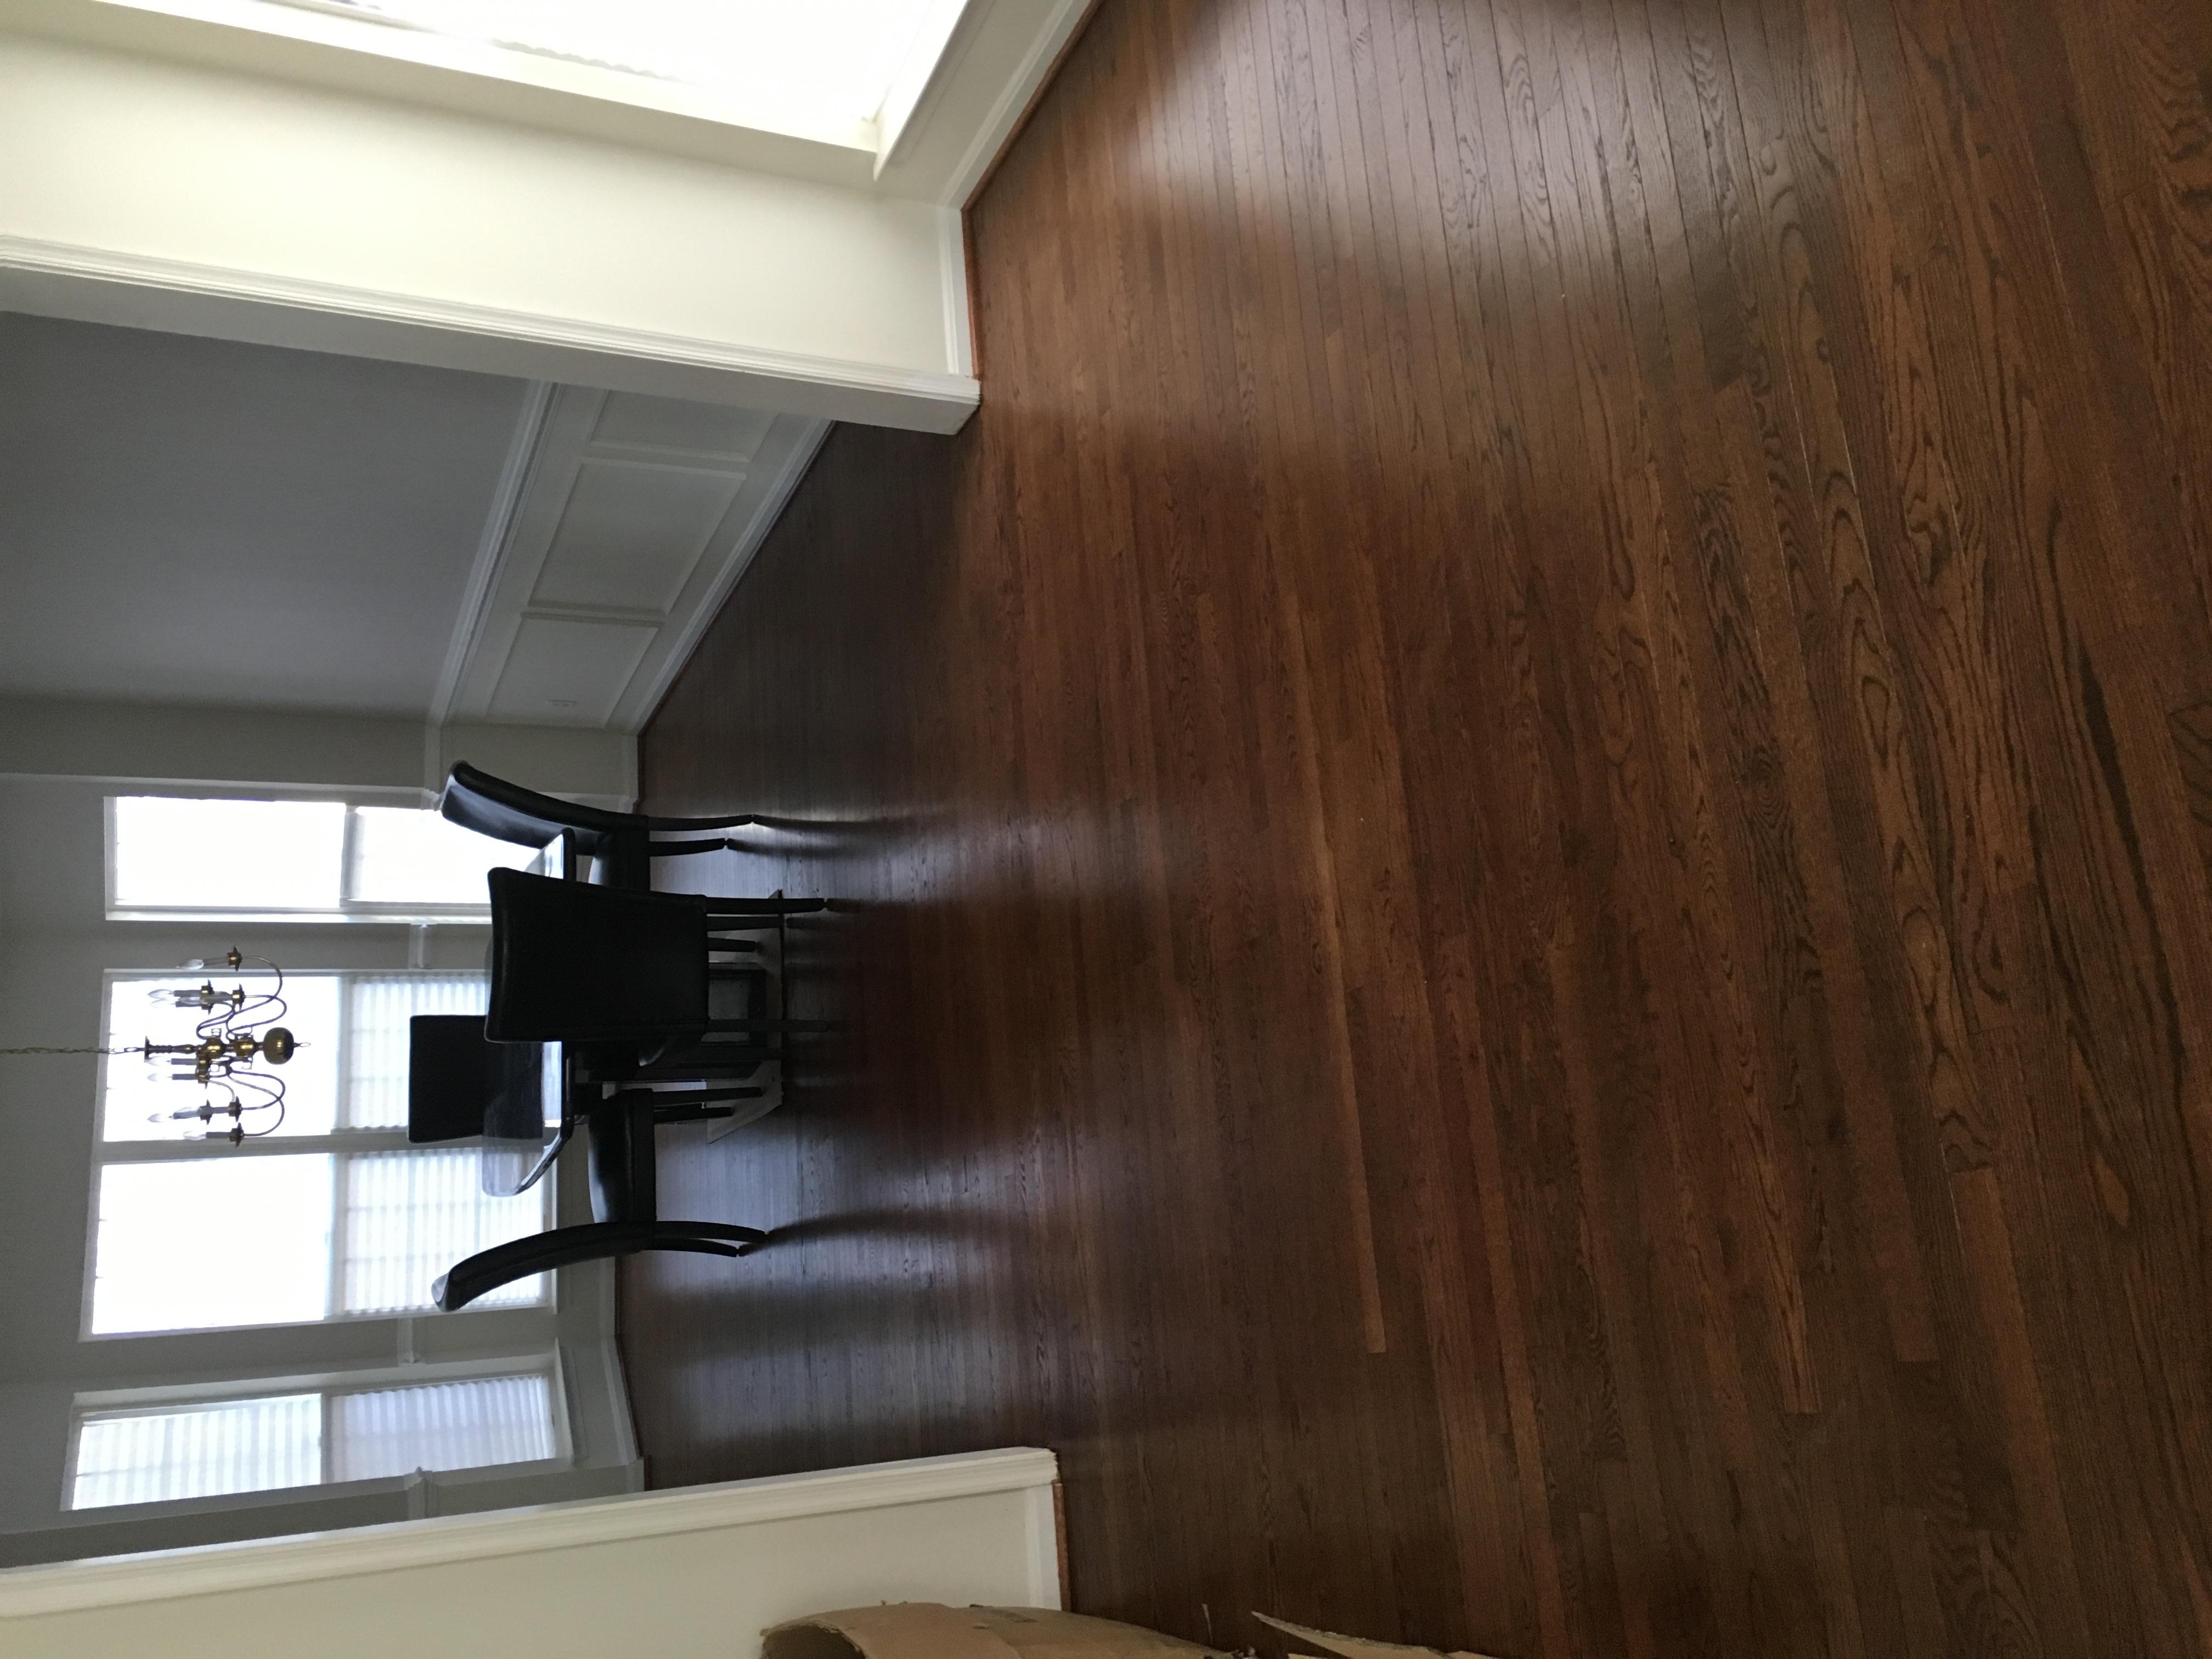 Re-stain hardwood